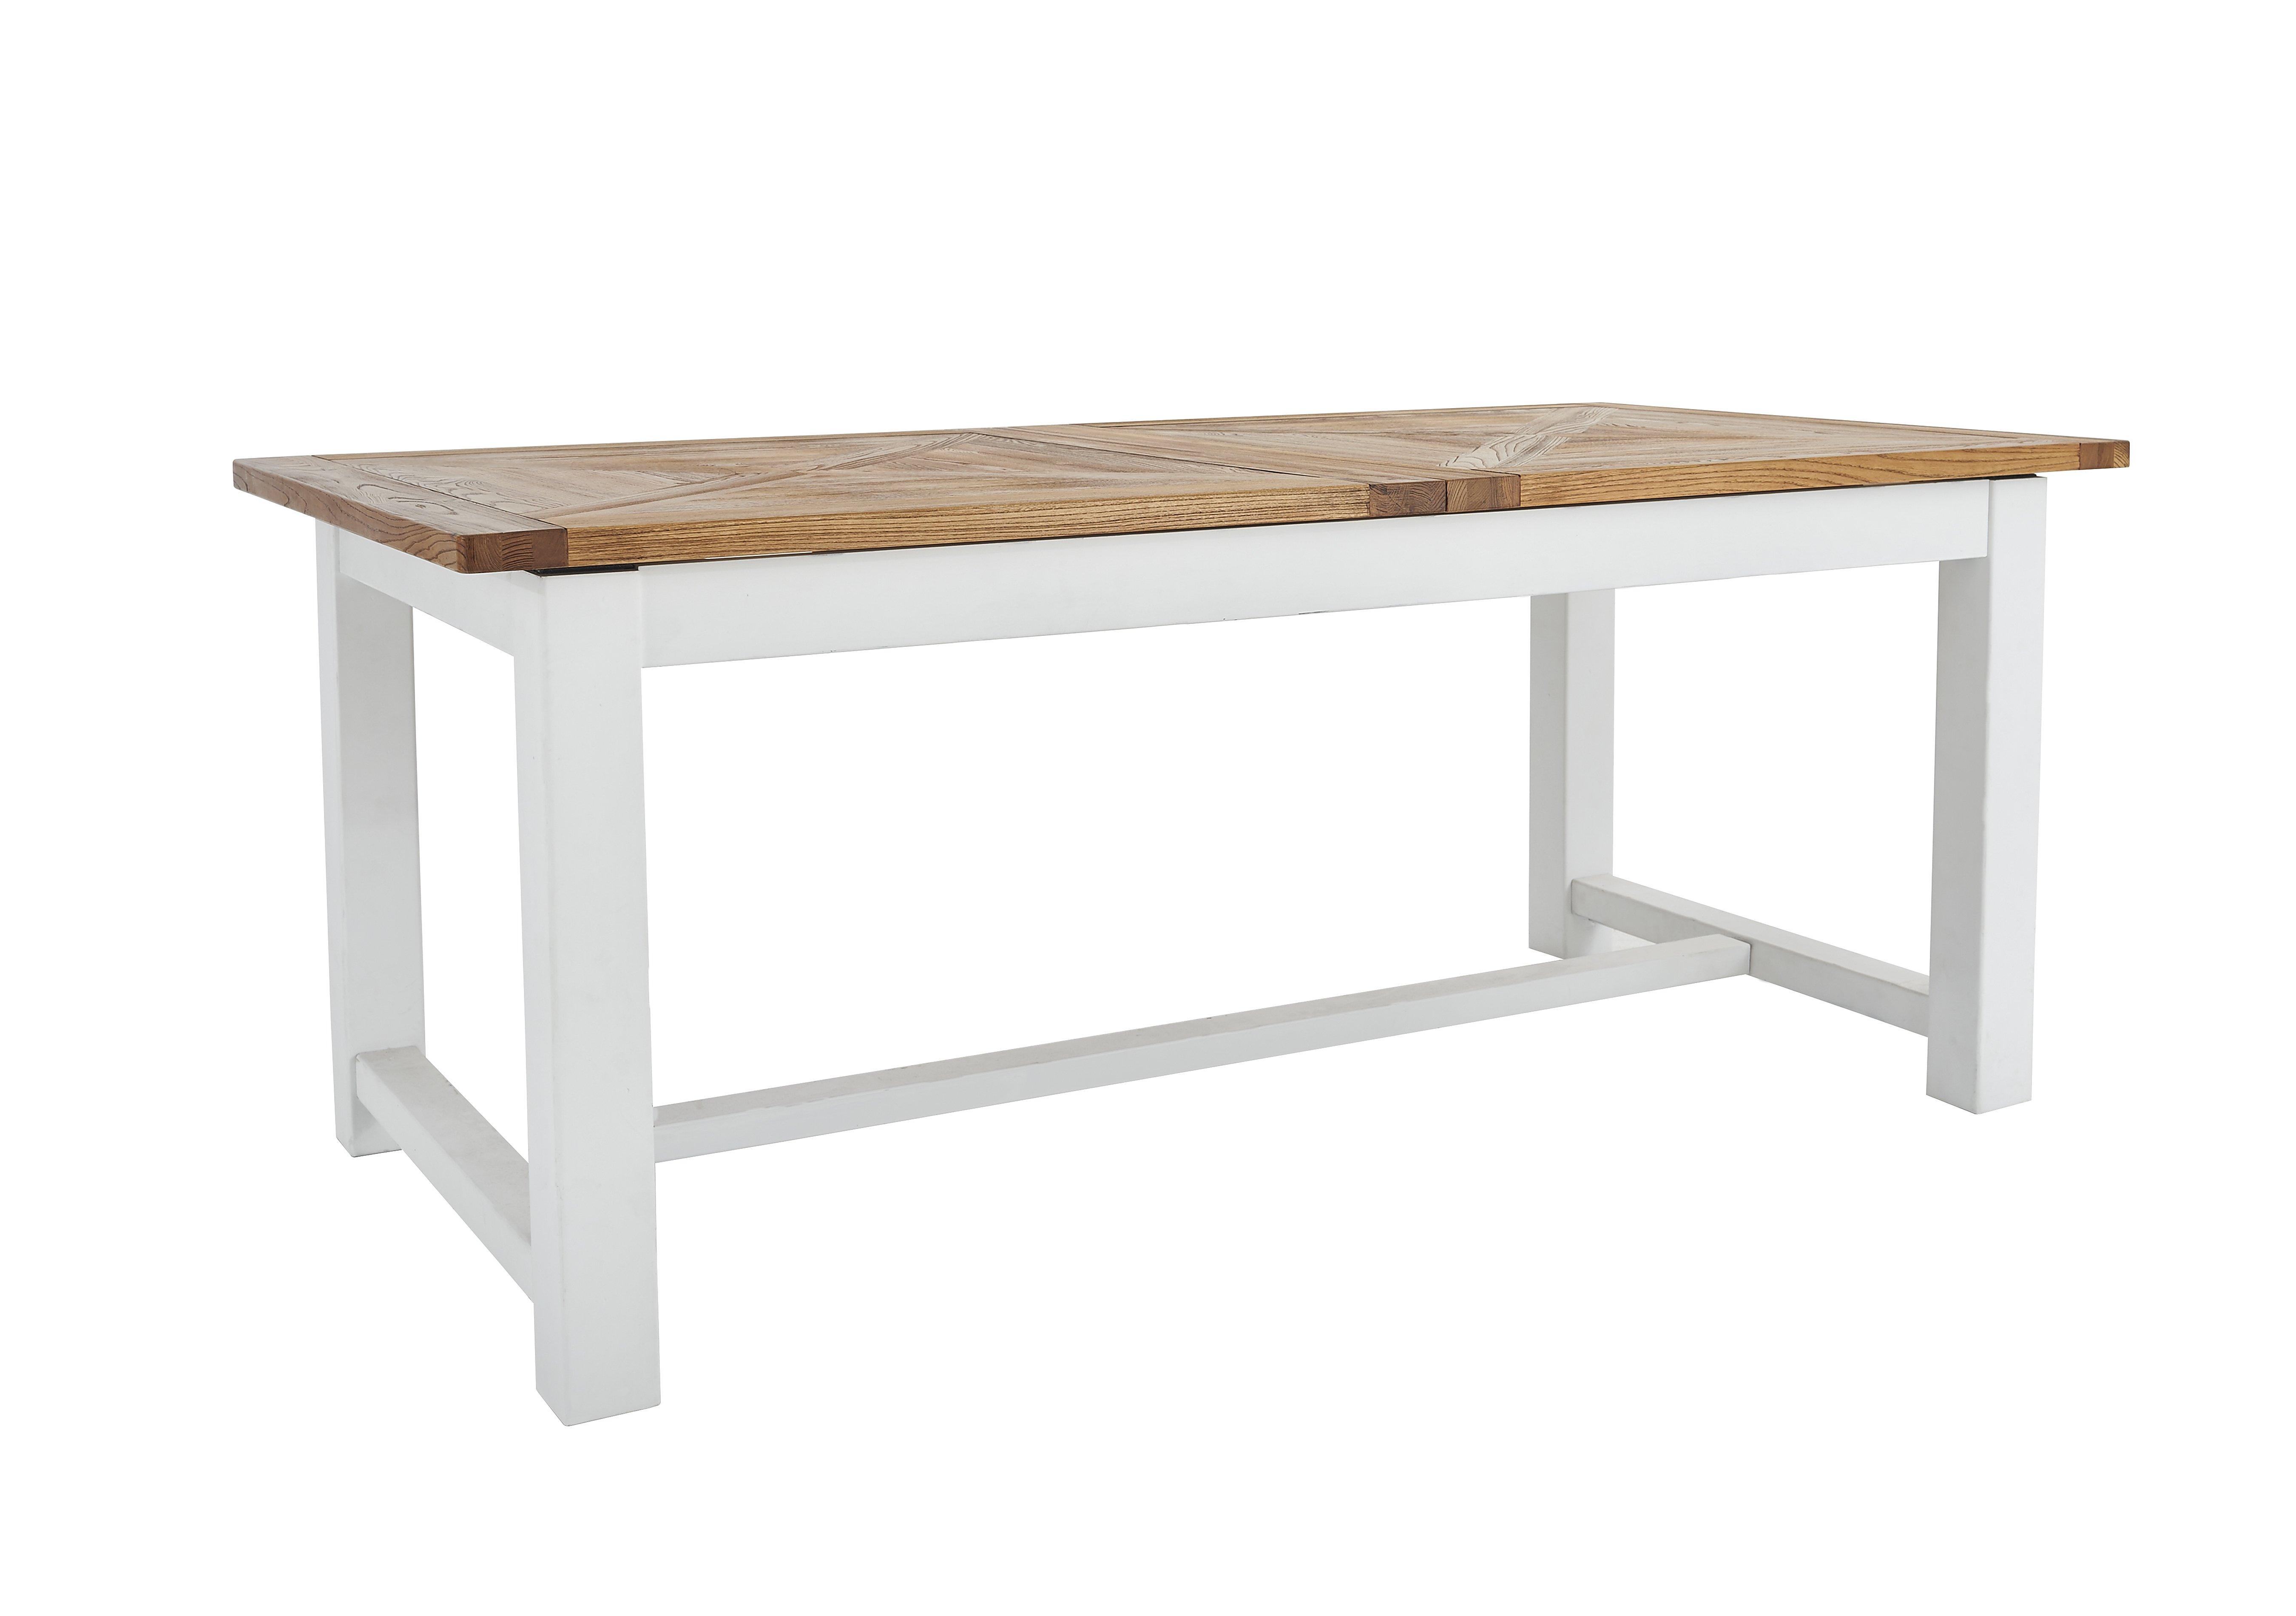 Furniture Village Insurance parquet extending dining table - furniture village